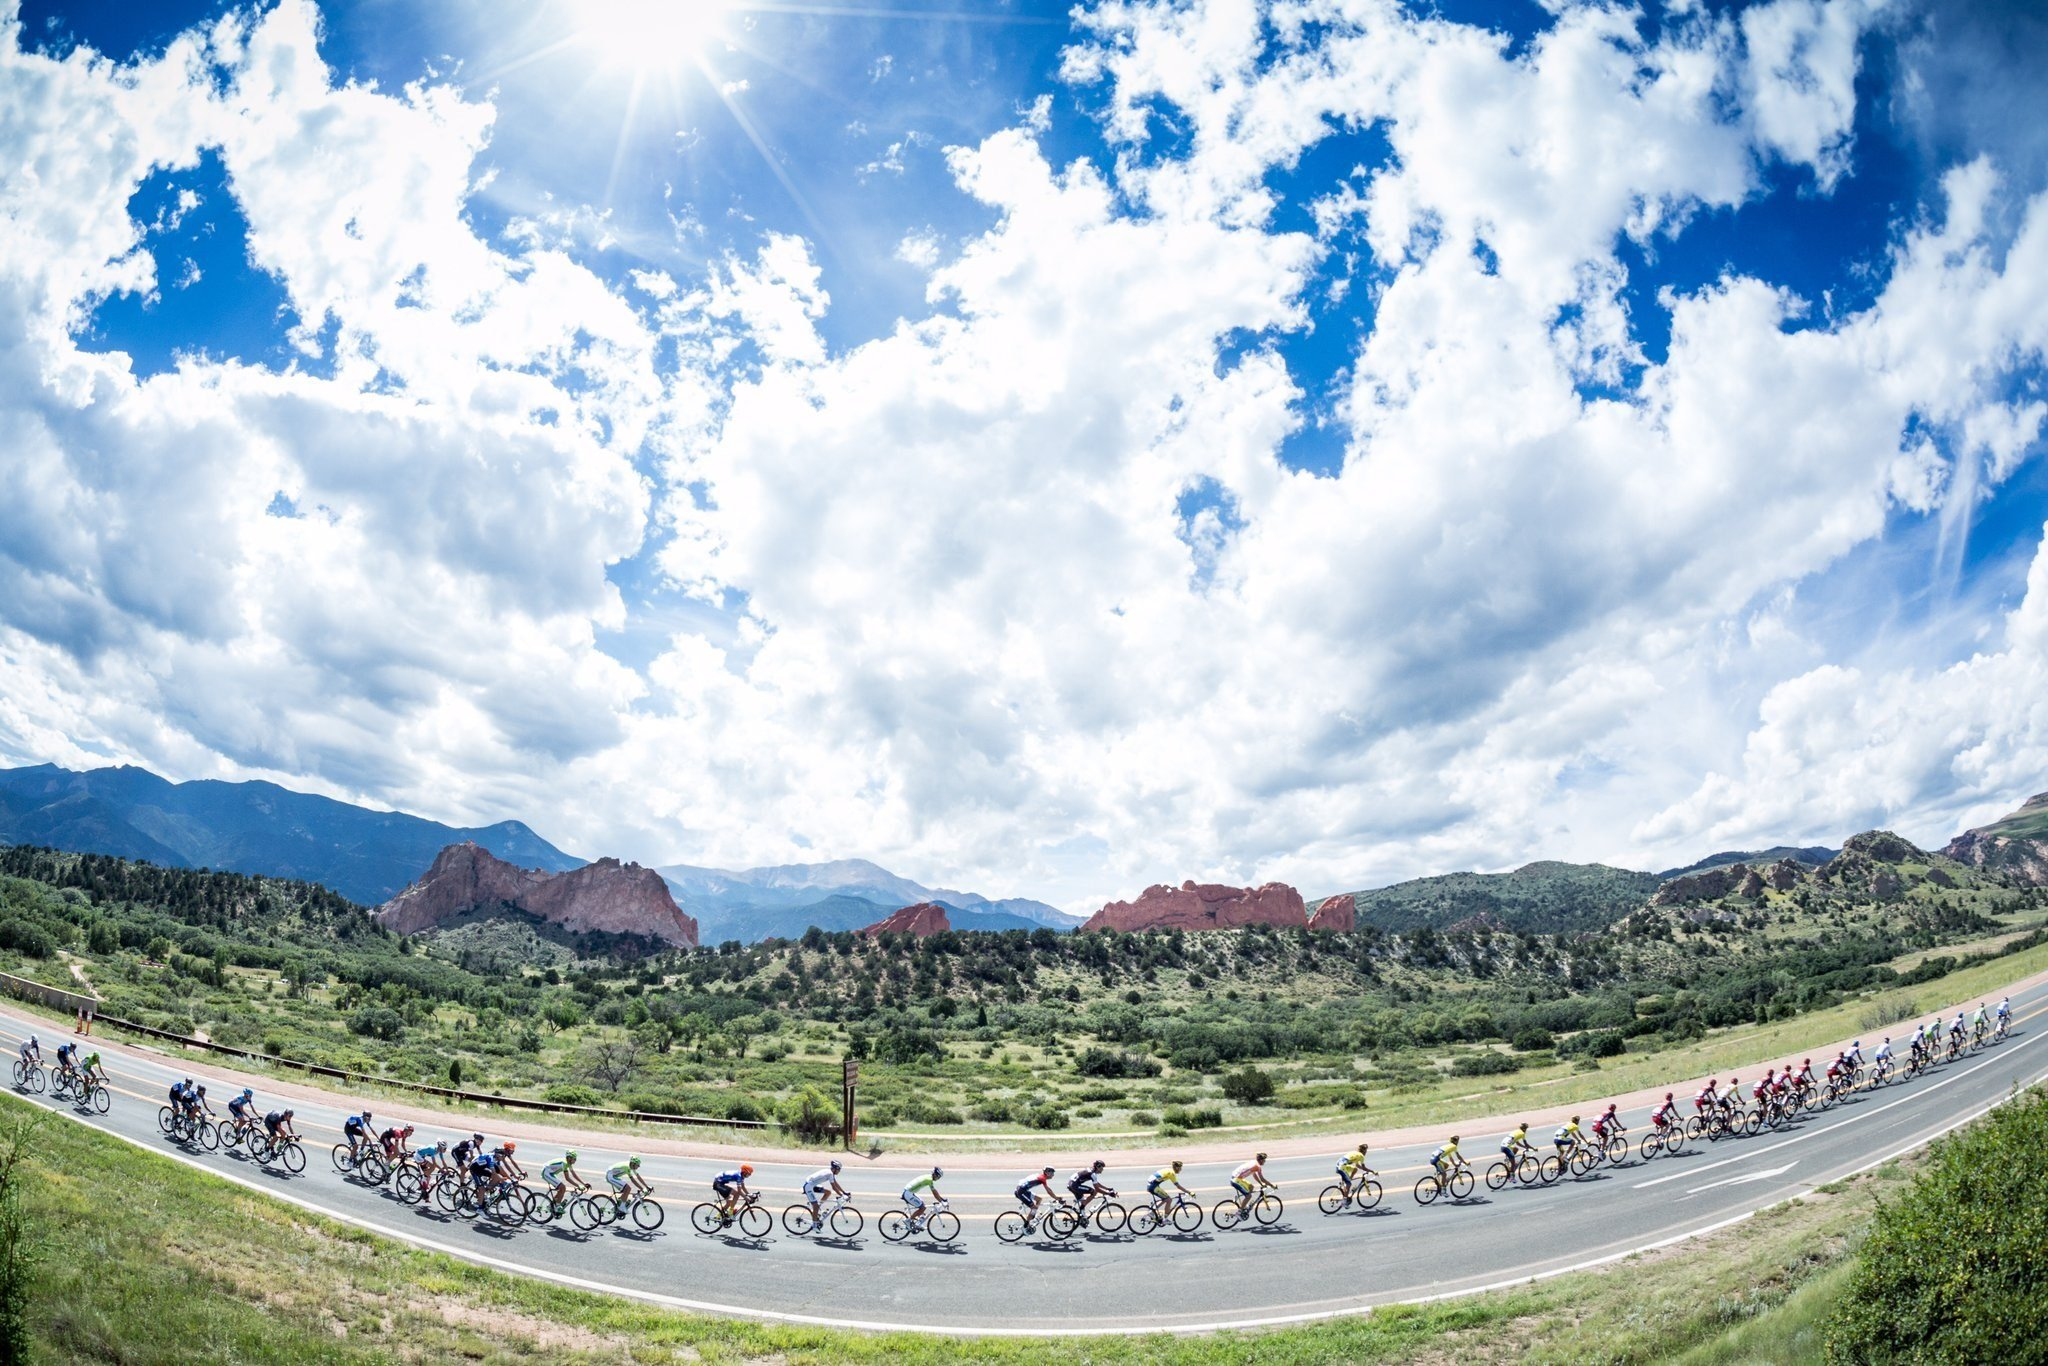 colorado classic bike race course announced koaa com